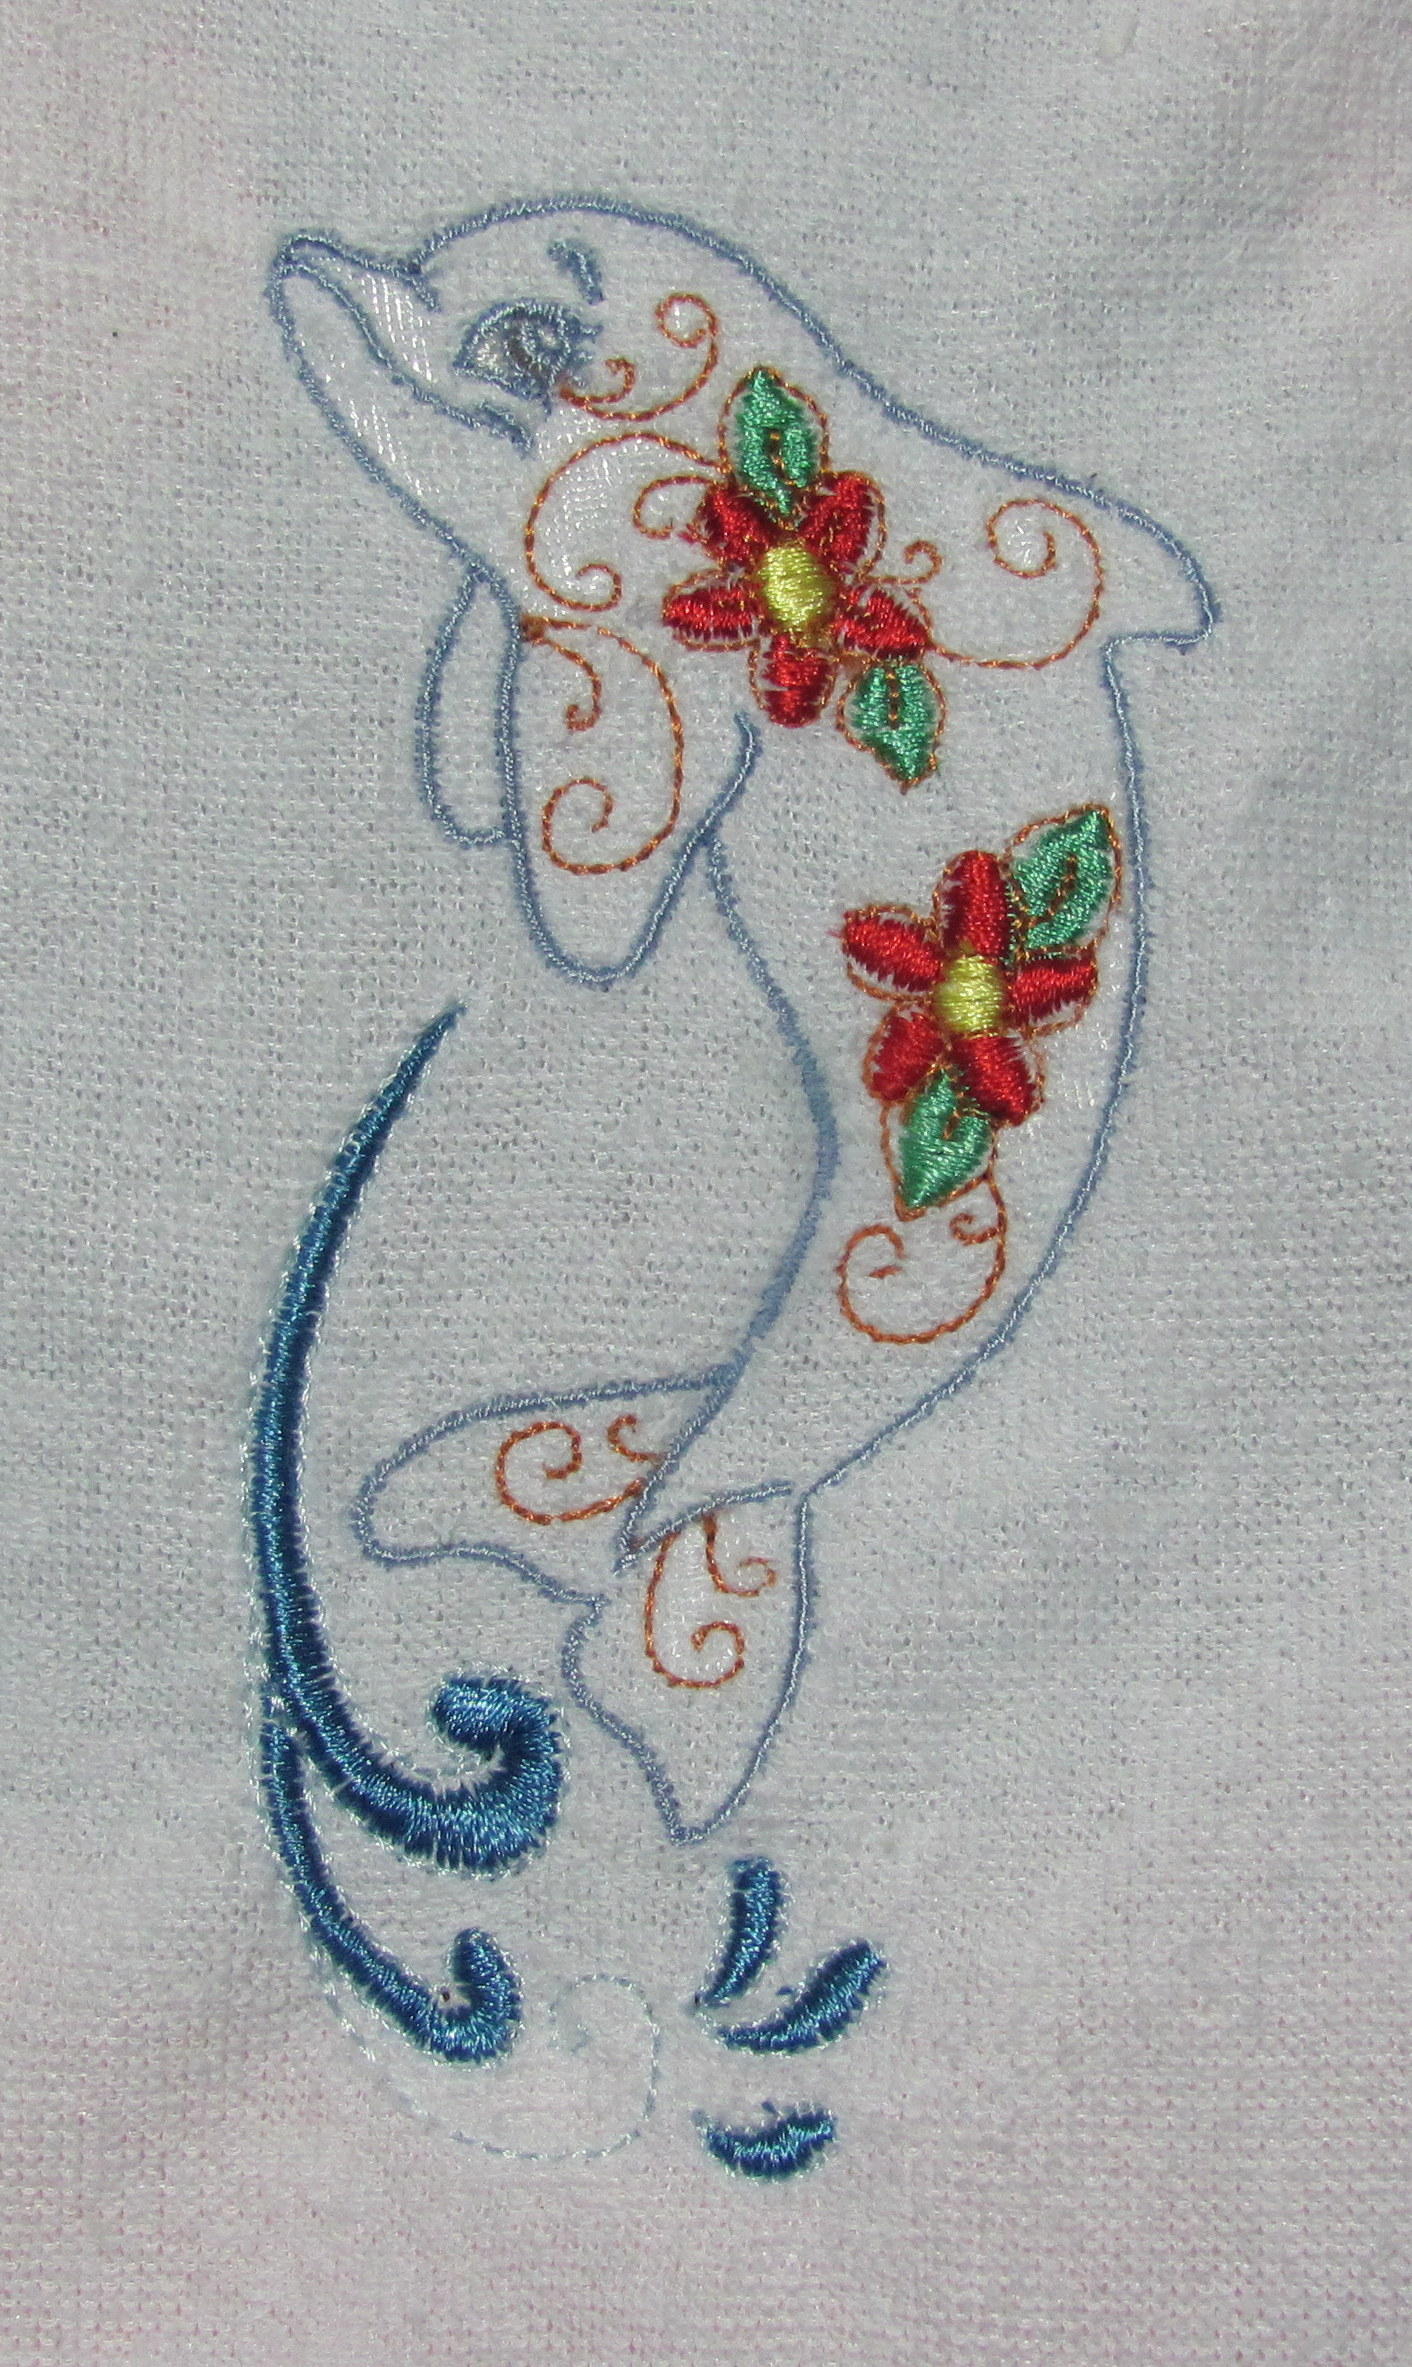 embroidery machine pe770